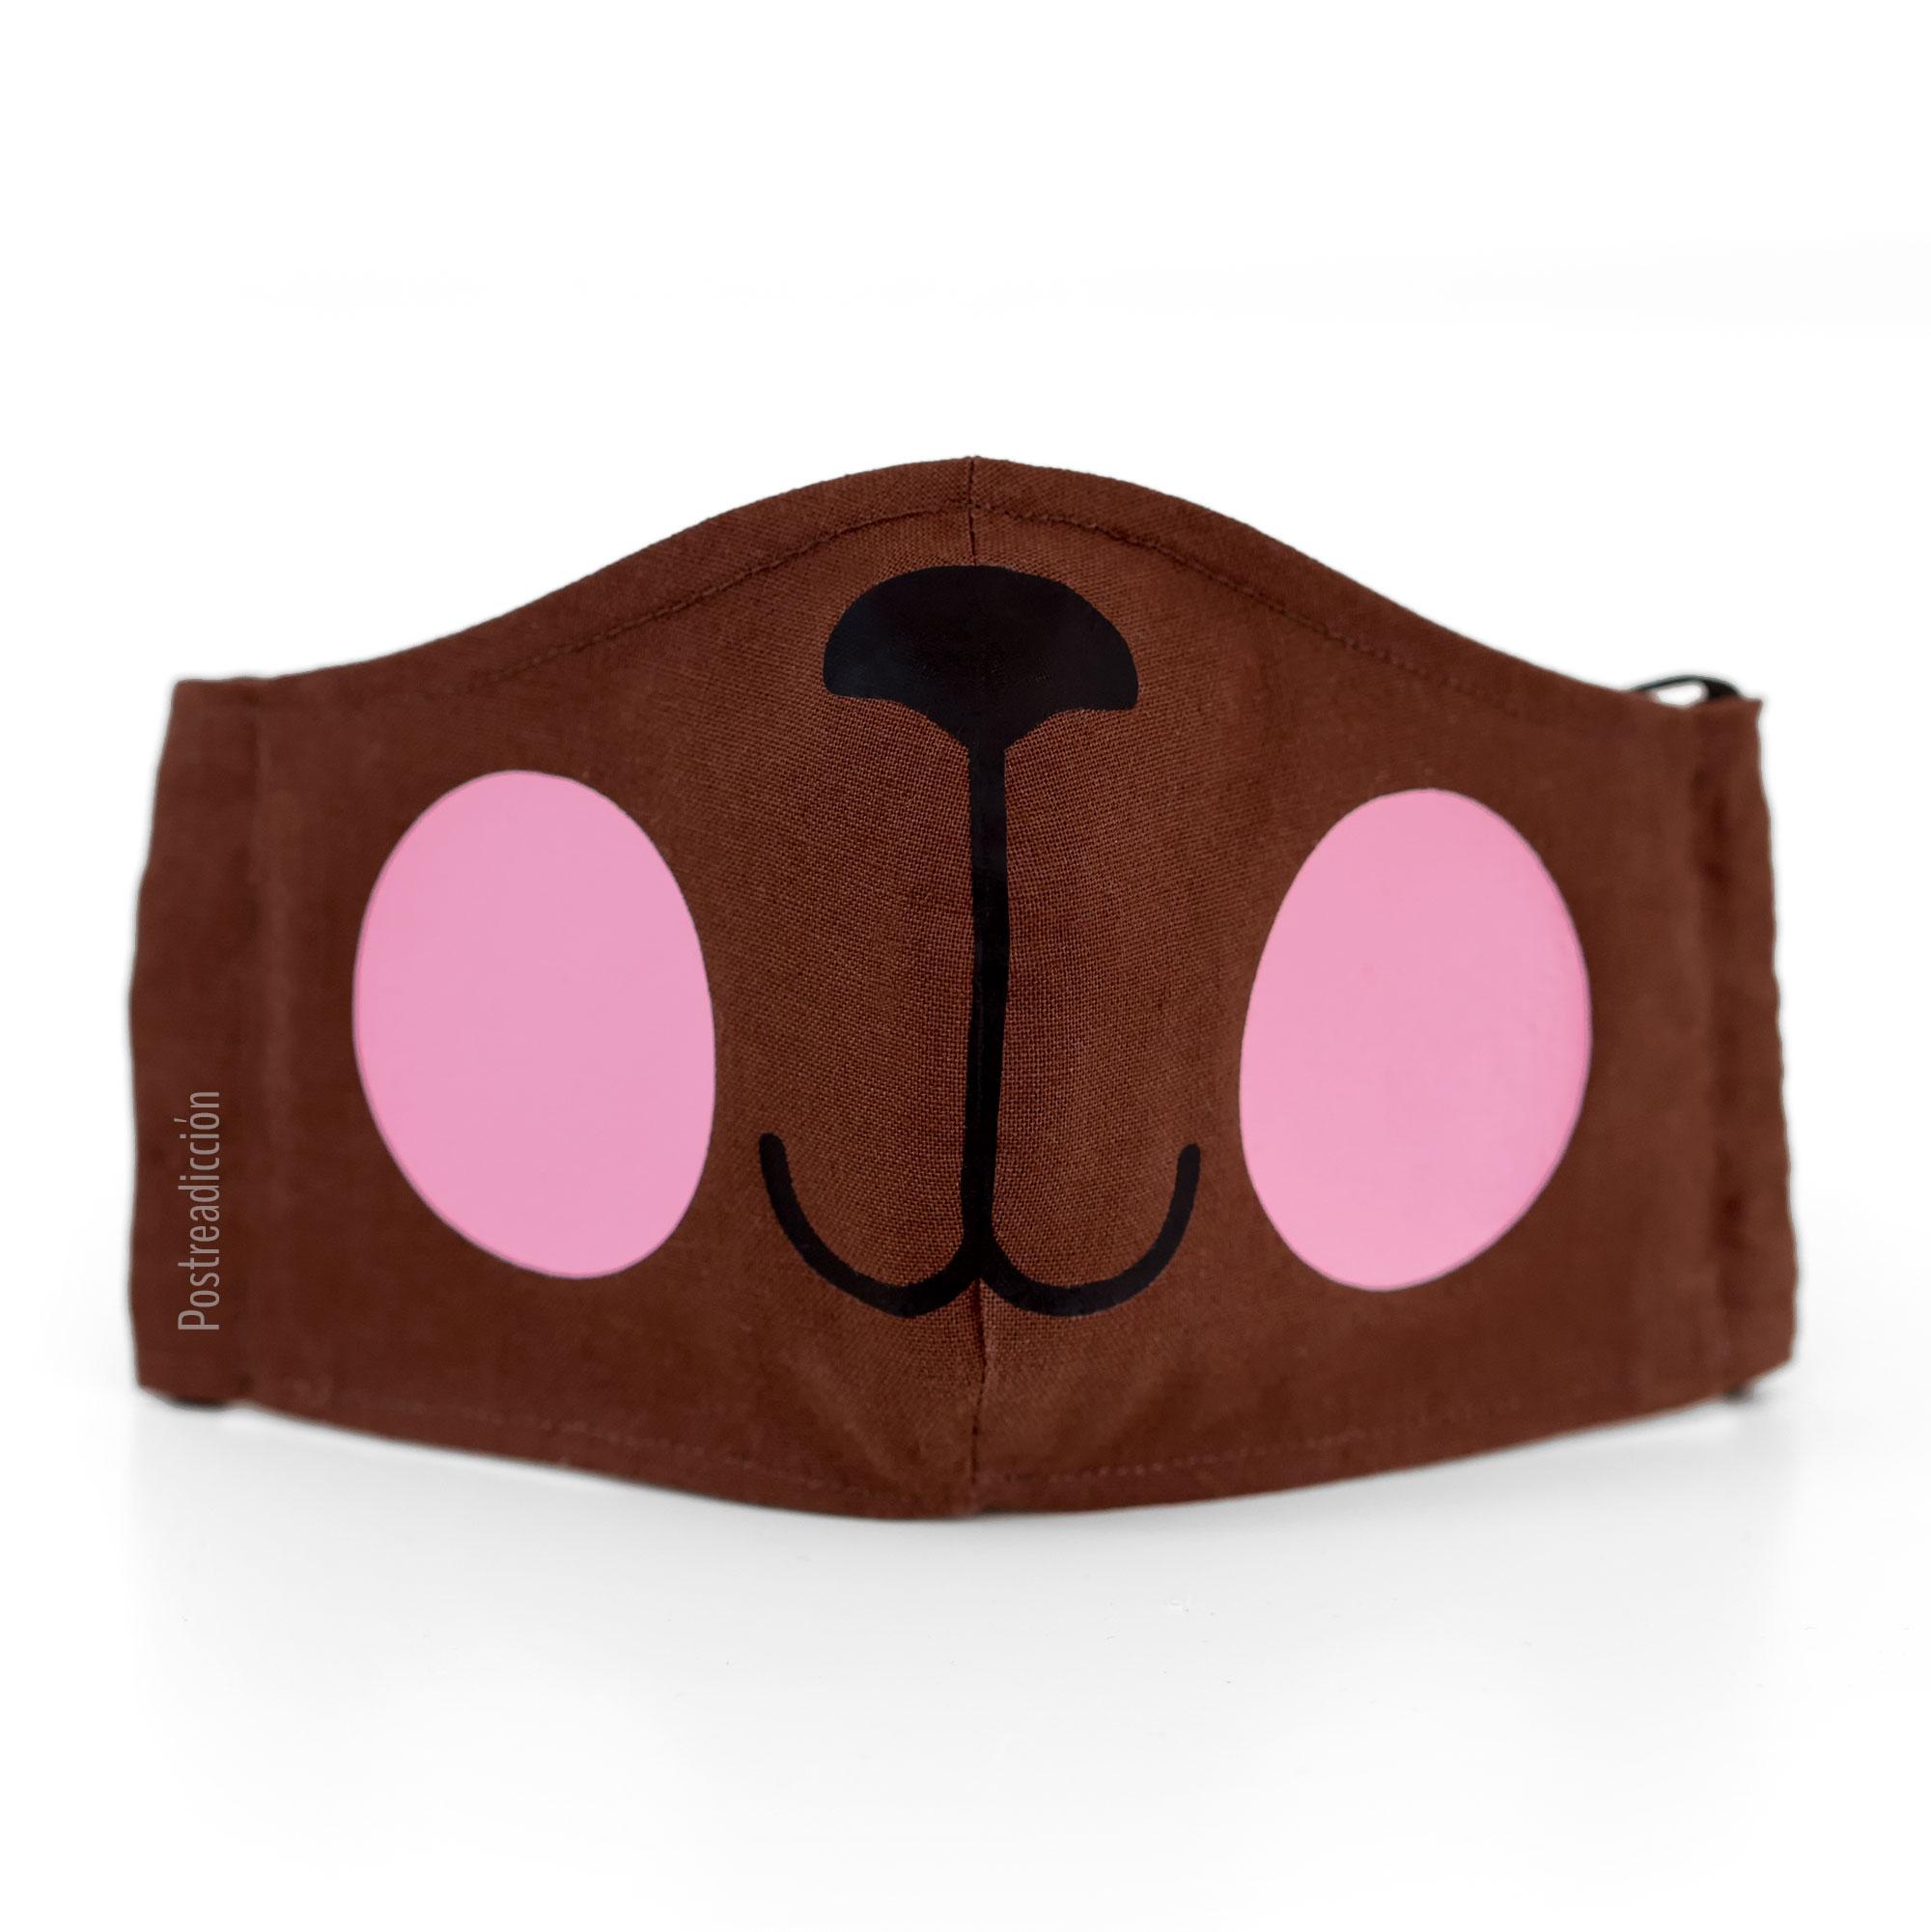 Imagen del producto: Mascarilla osito marrón